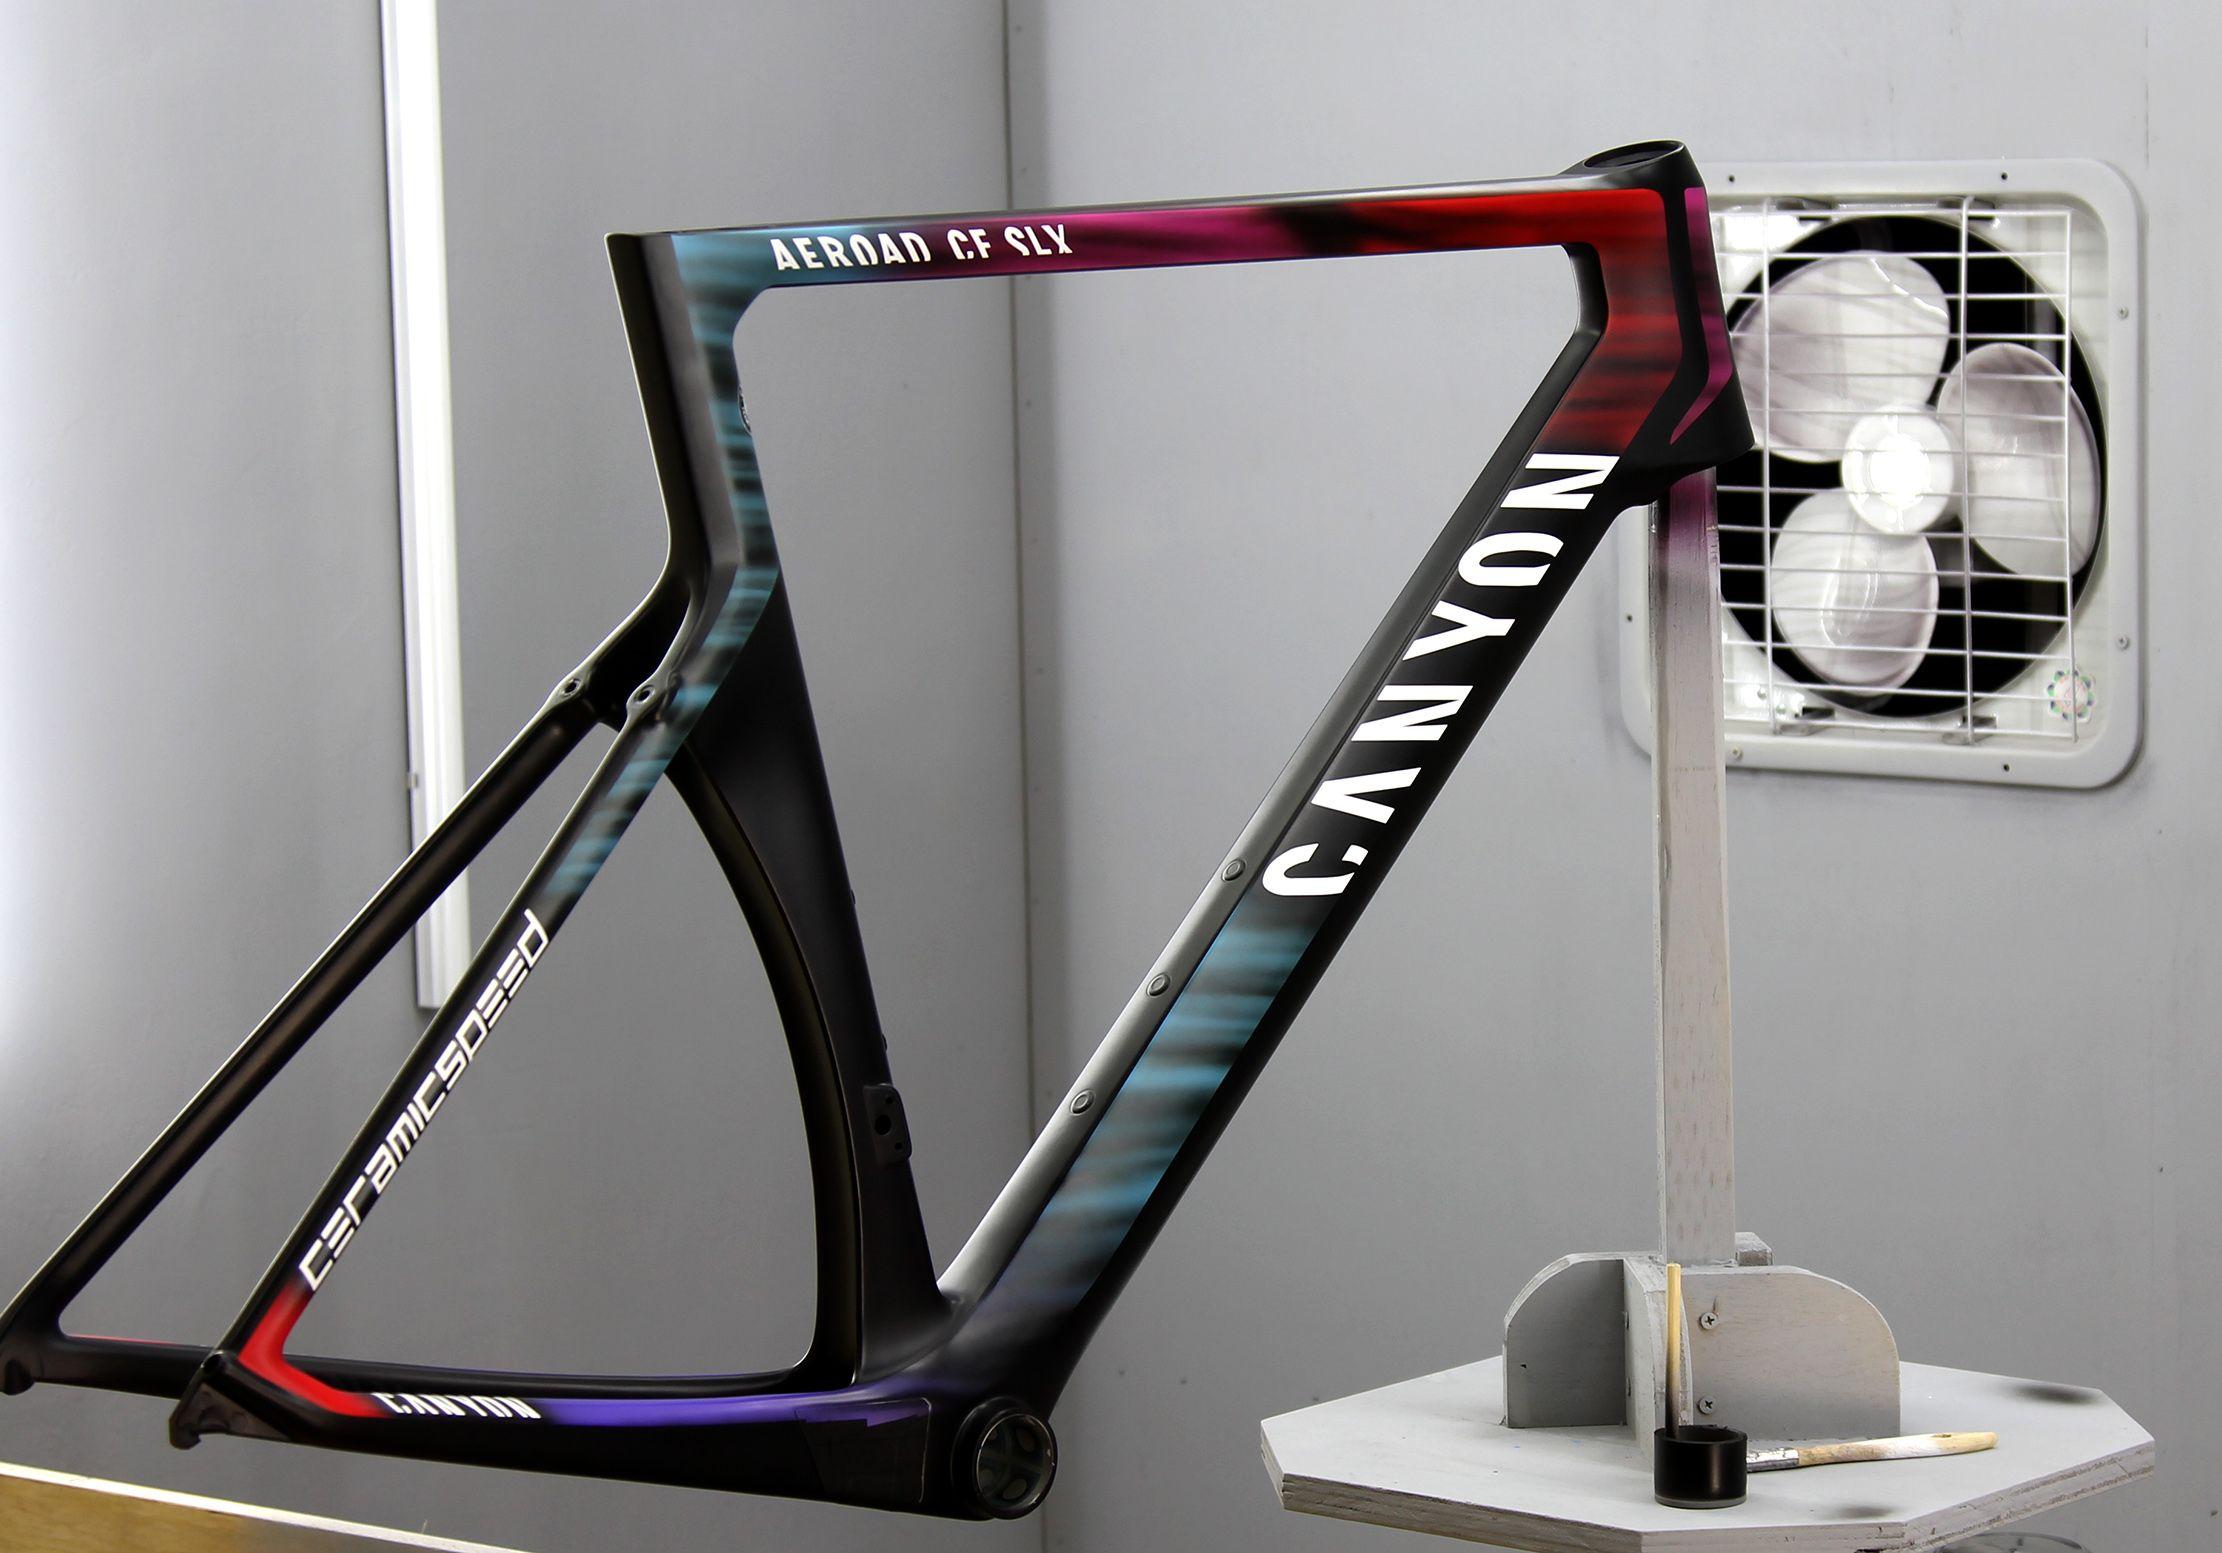 Canyon Aeroad Cf Slx Full Renovation And Respray Bicycle Paint